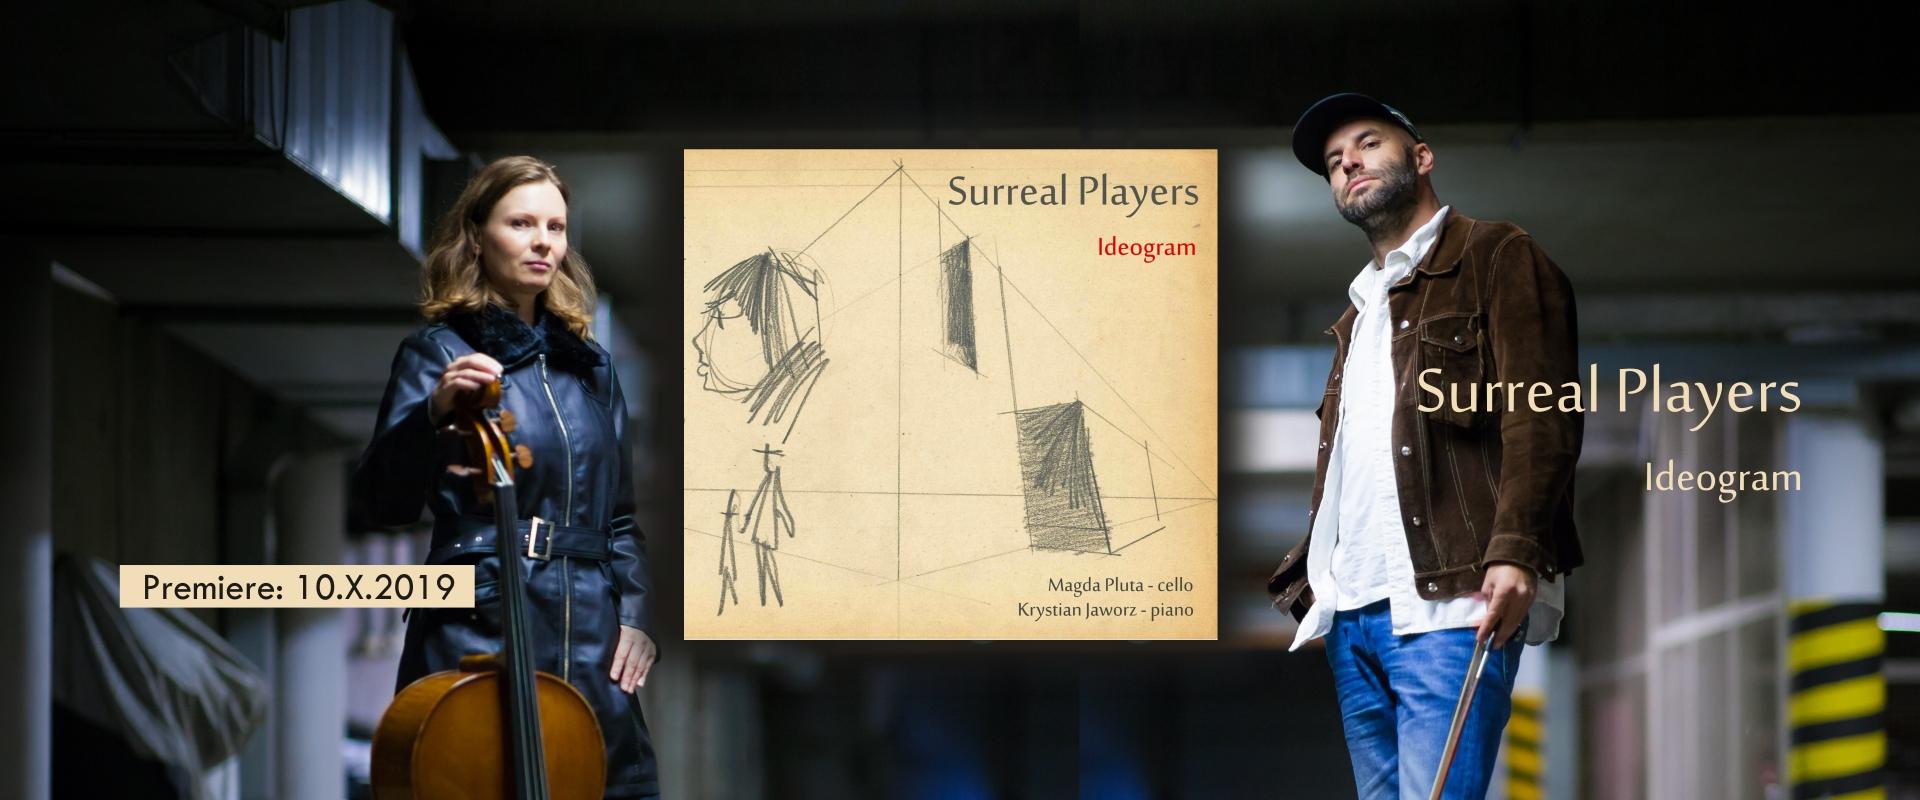 Surreal Players - Ideogram - baner